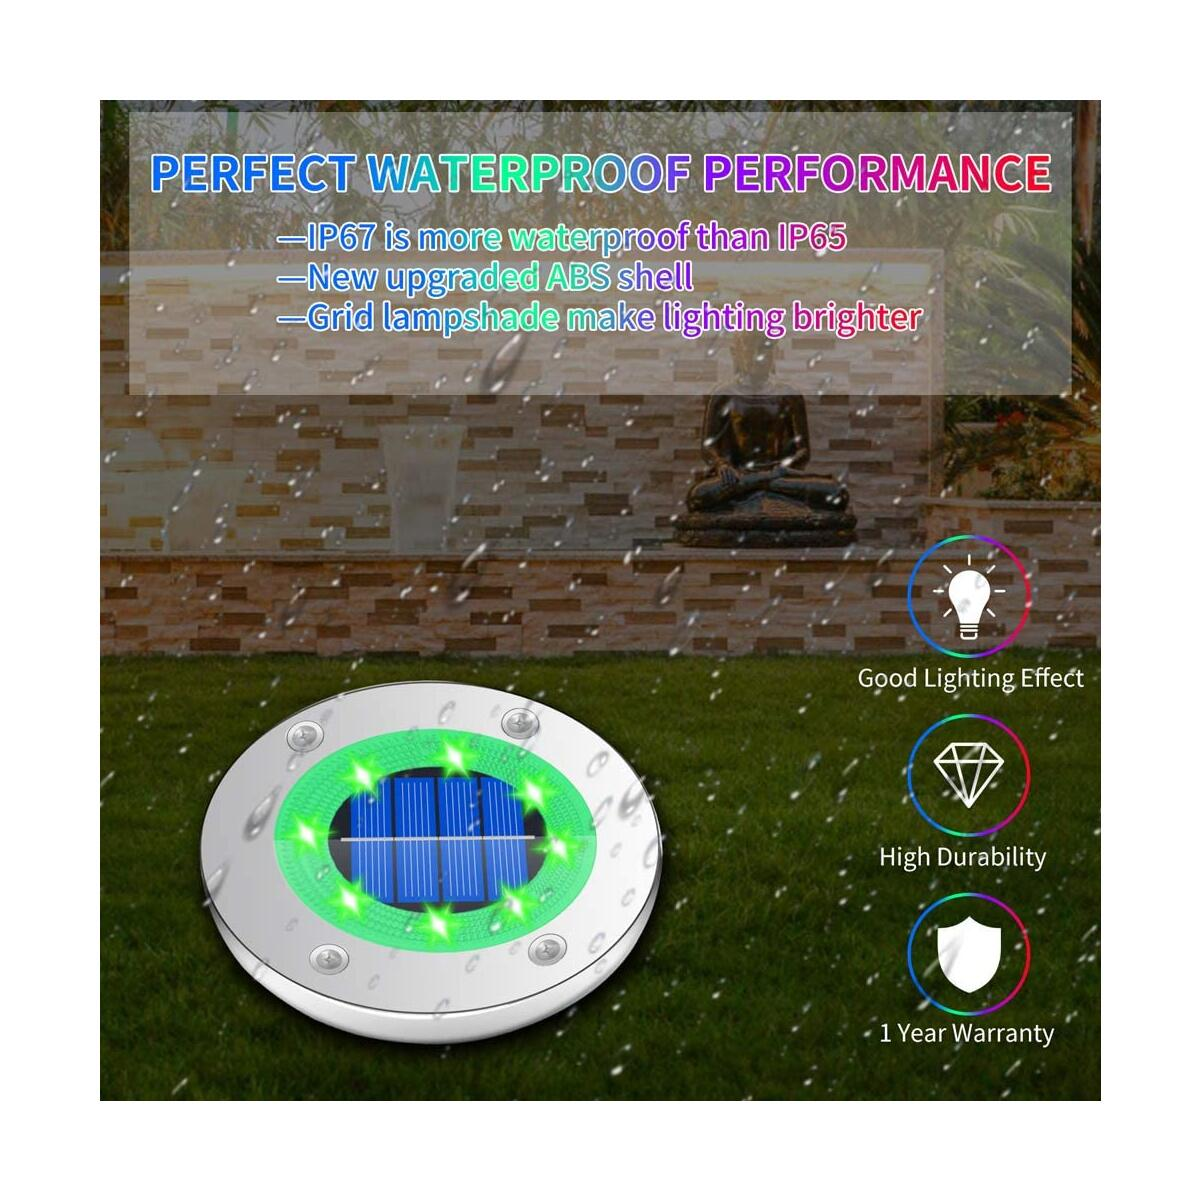 Solar Ground Lights Outdoor,8 LED Yard Solar in-Garden Lights IP67 Waterproof Solar Disk Lights 6000K Color Changing Walkway Landscape Lighting for Pathway Garden Lawn Patio(4 Pack)